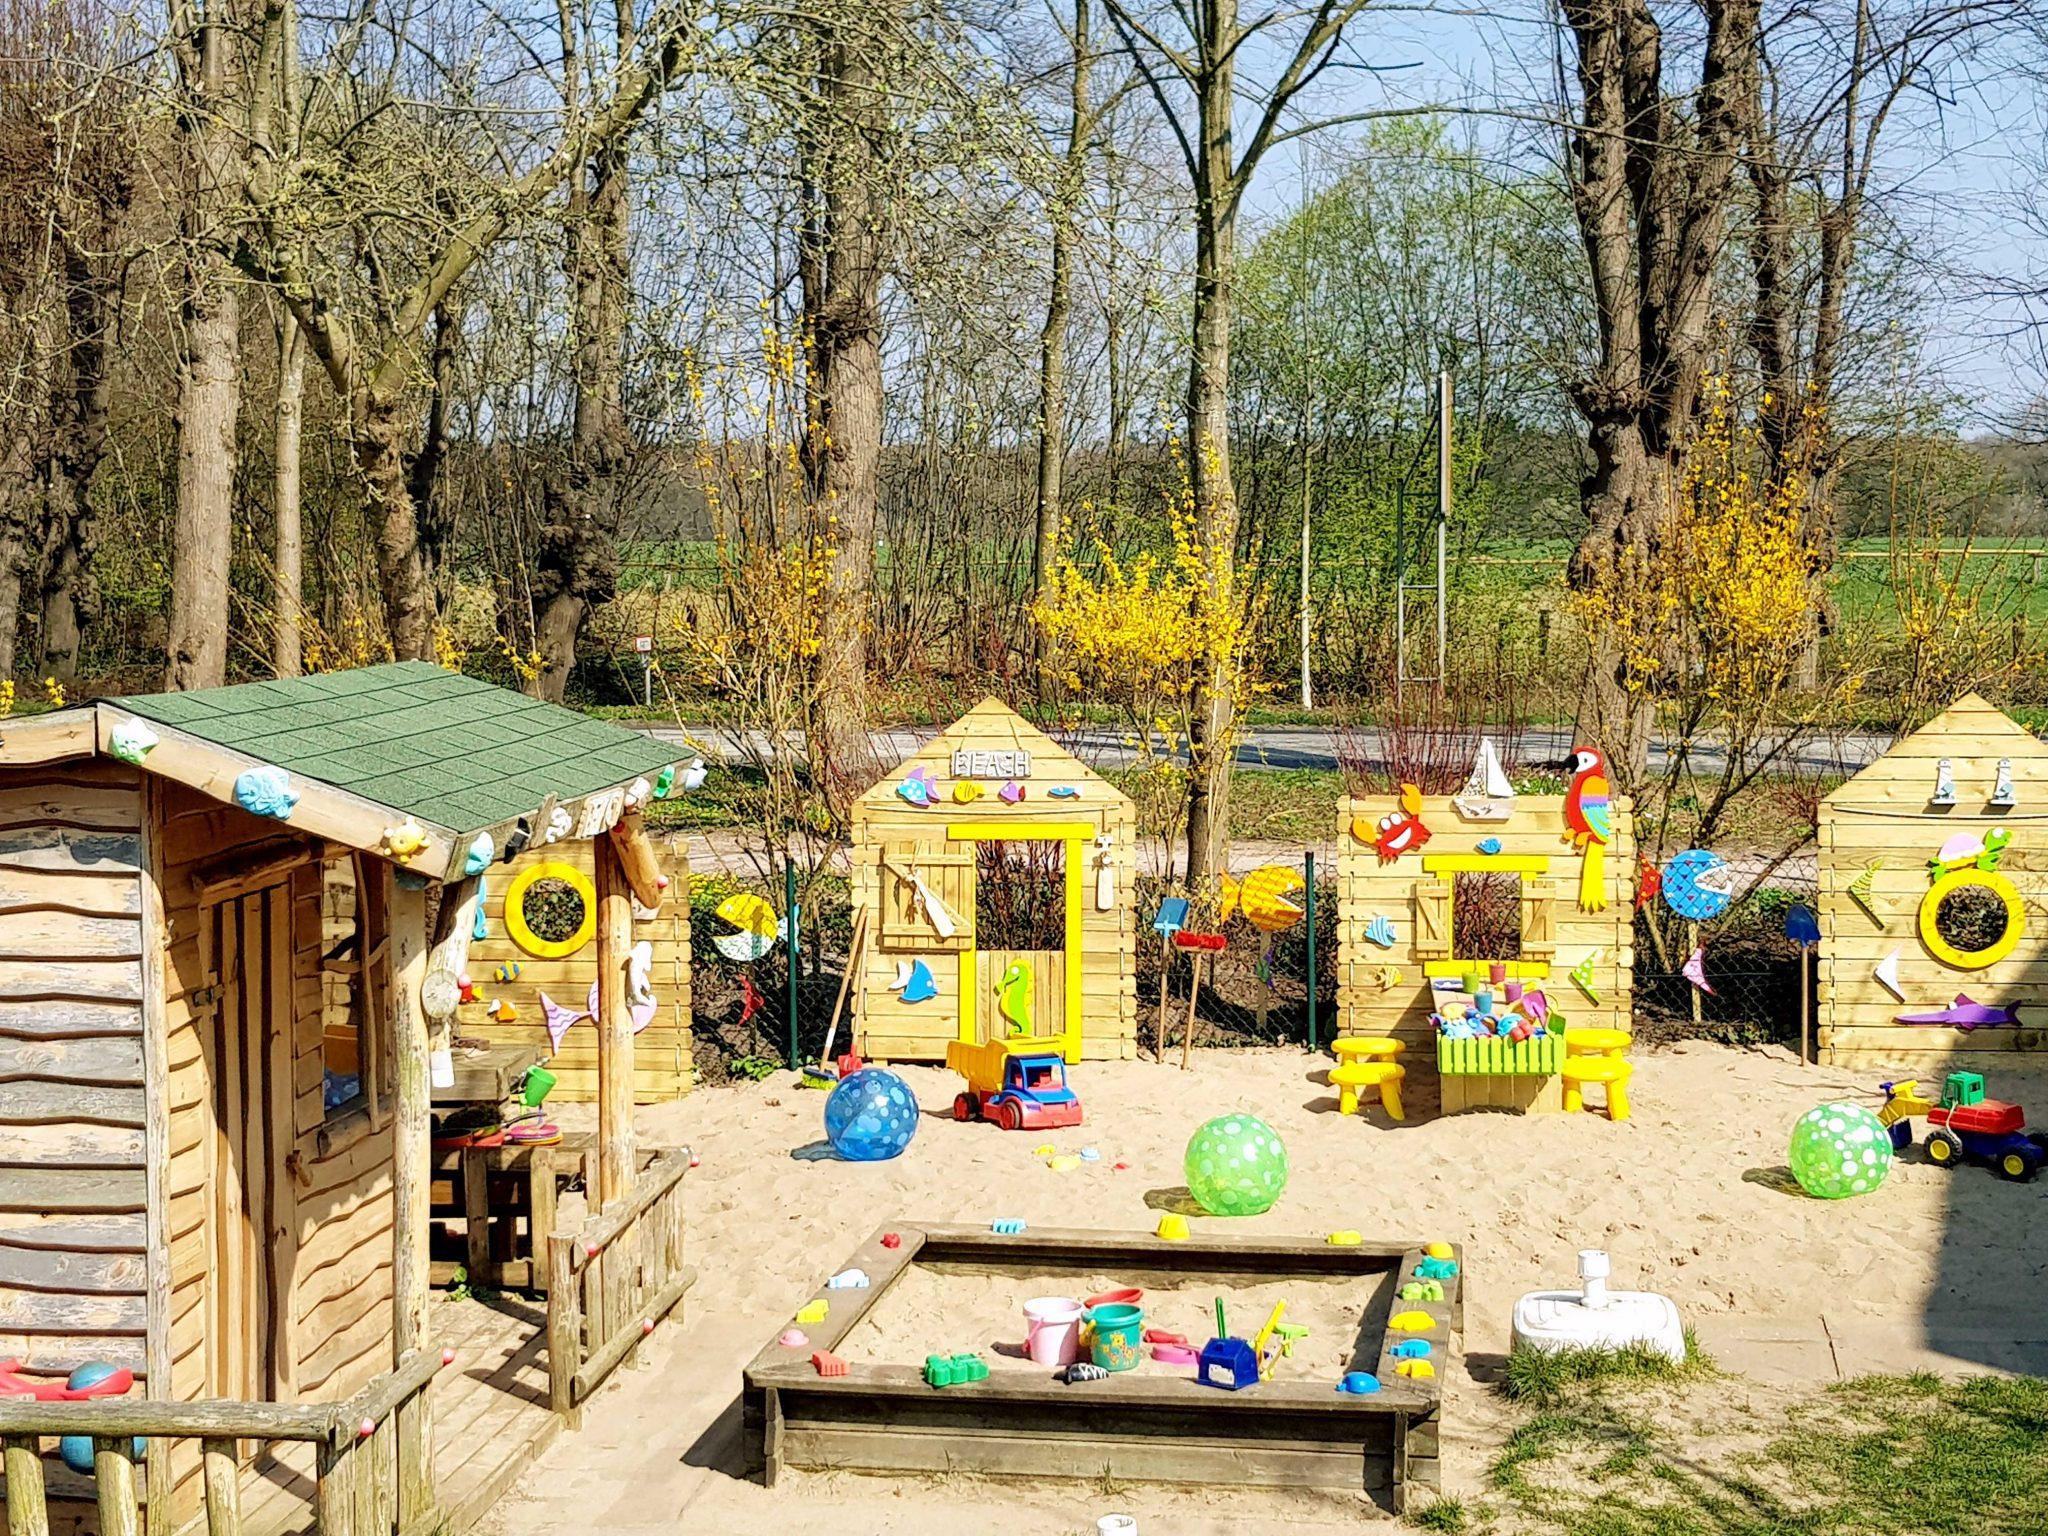 Kita Kid Zone Kinderbetreuung Garten1 24 - Betreuungspaket